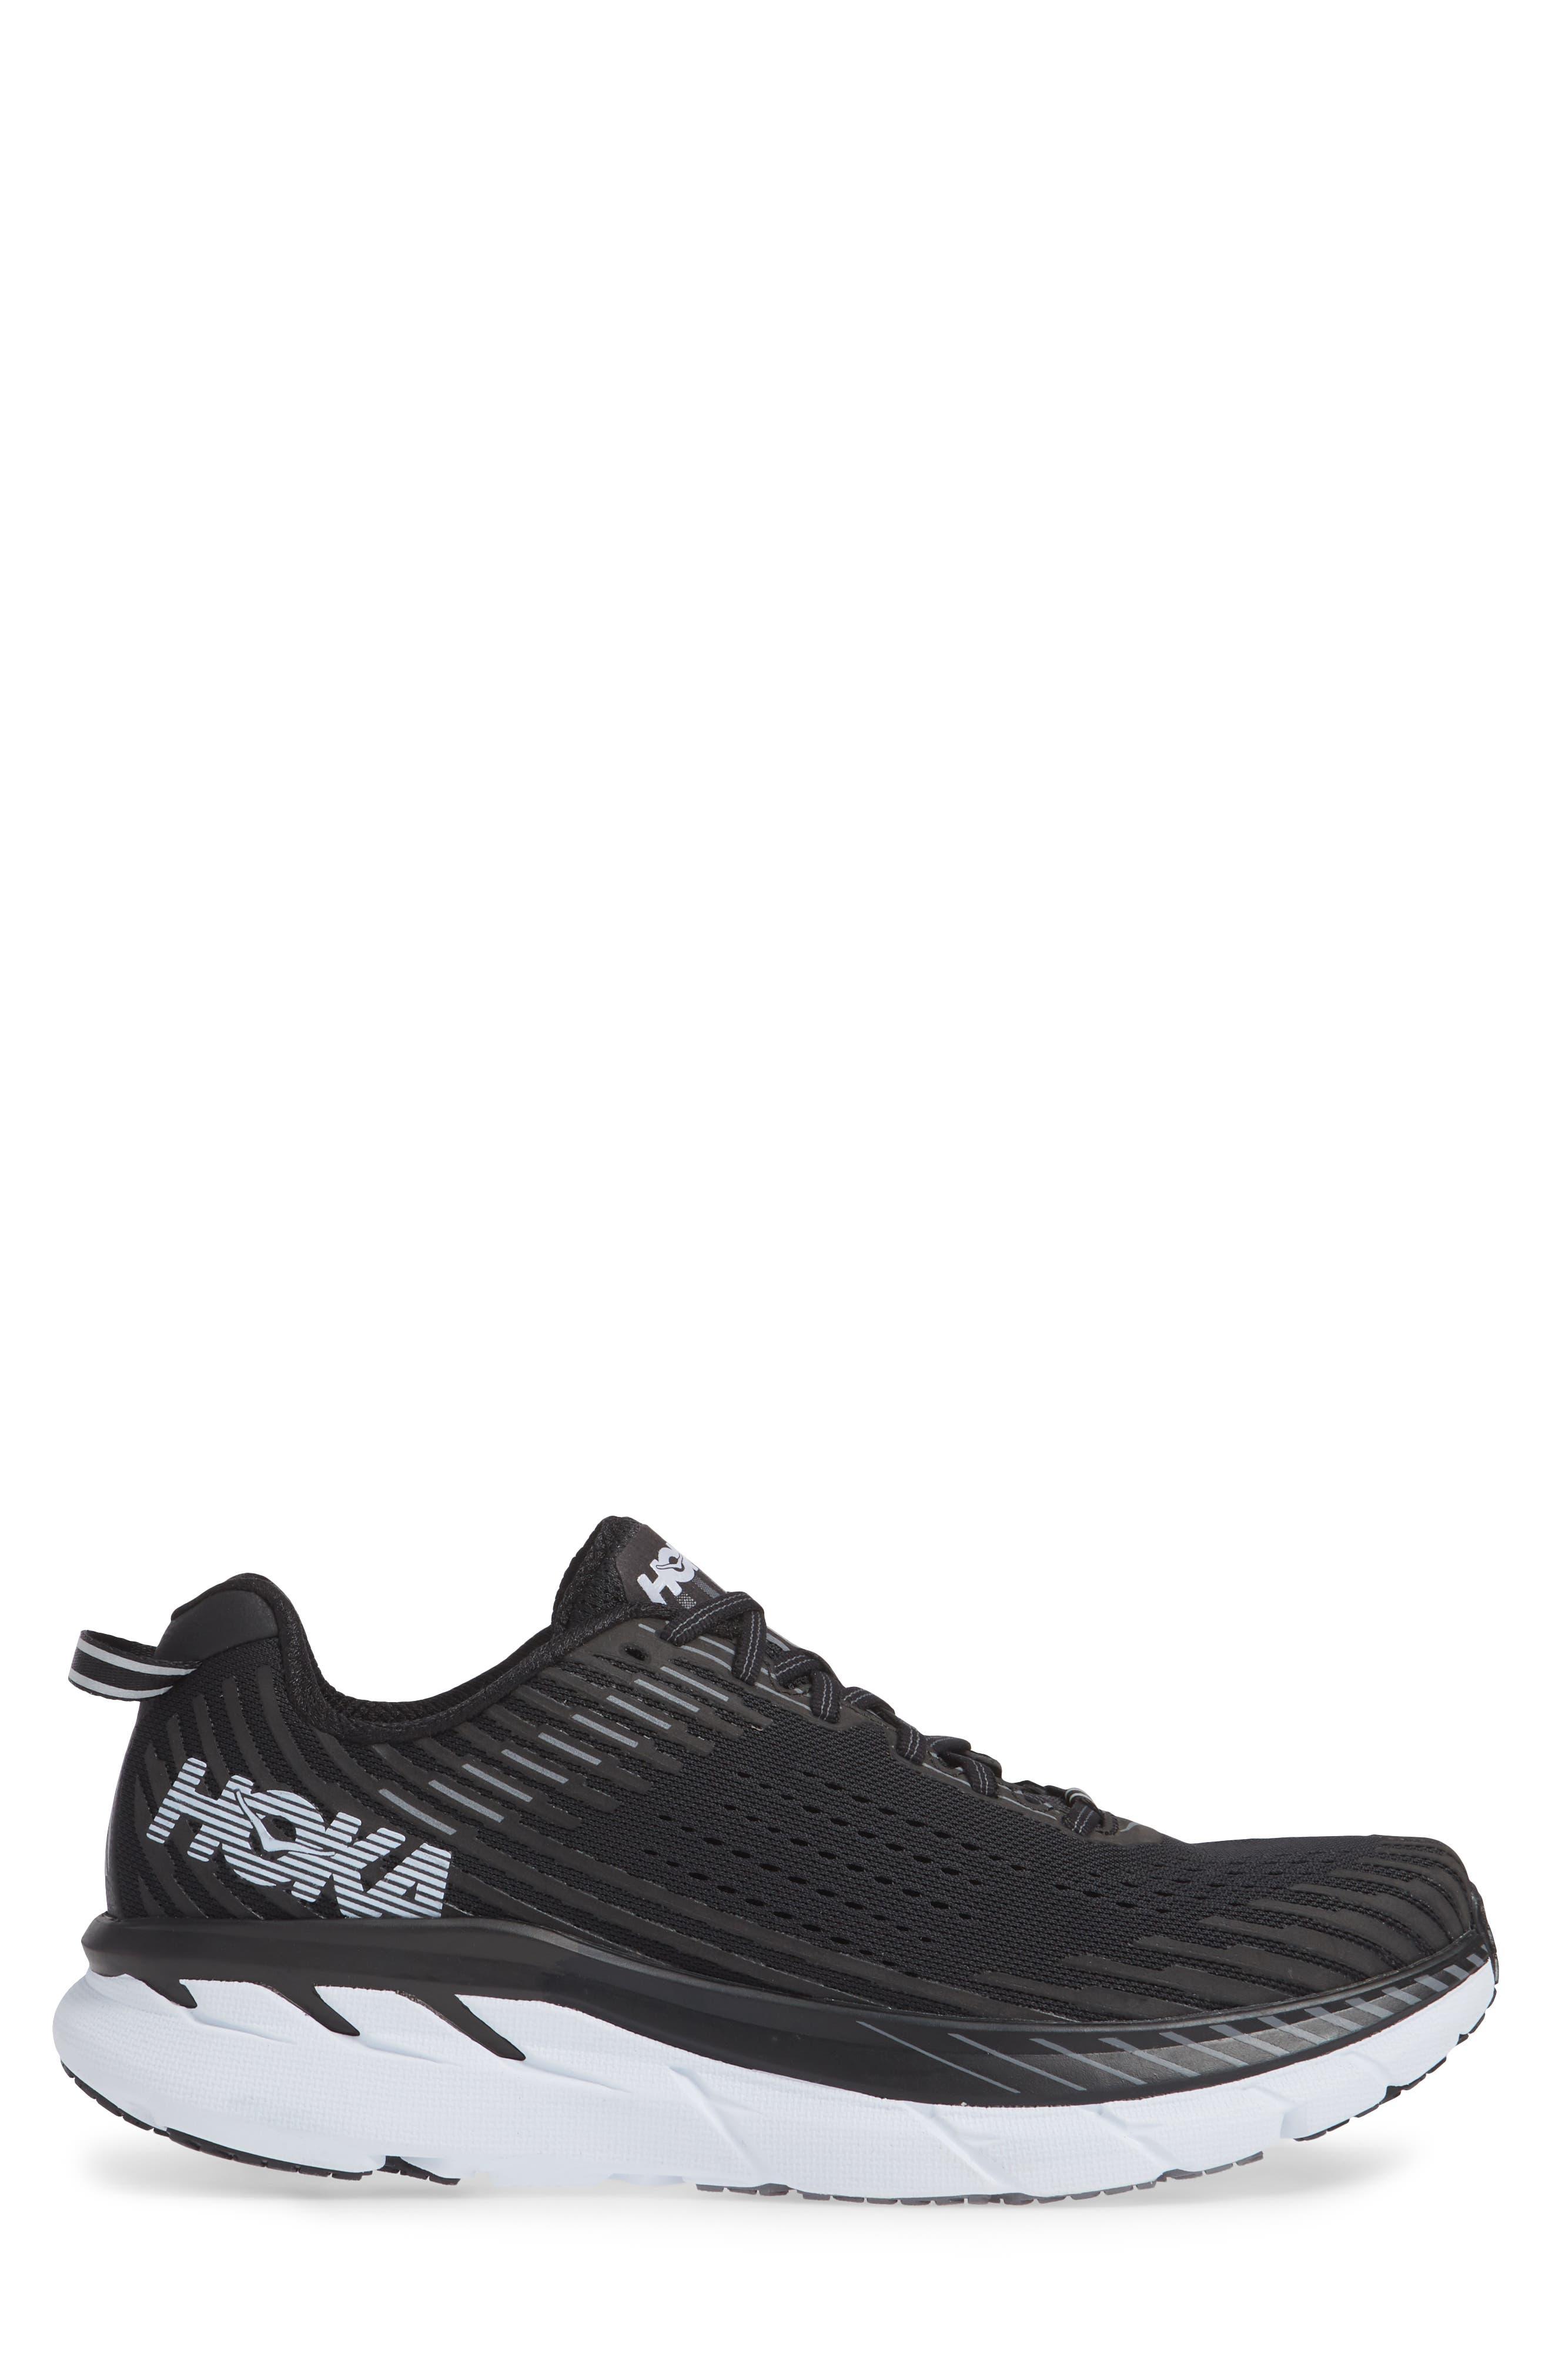 Clifton 5 Running Shoe,                             Alternate thumbnail 3, color,                             BLACK/ WHITE